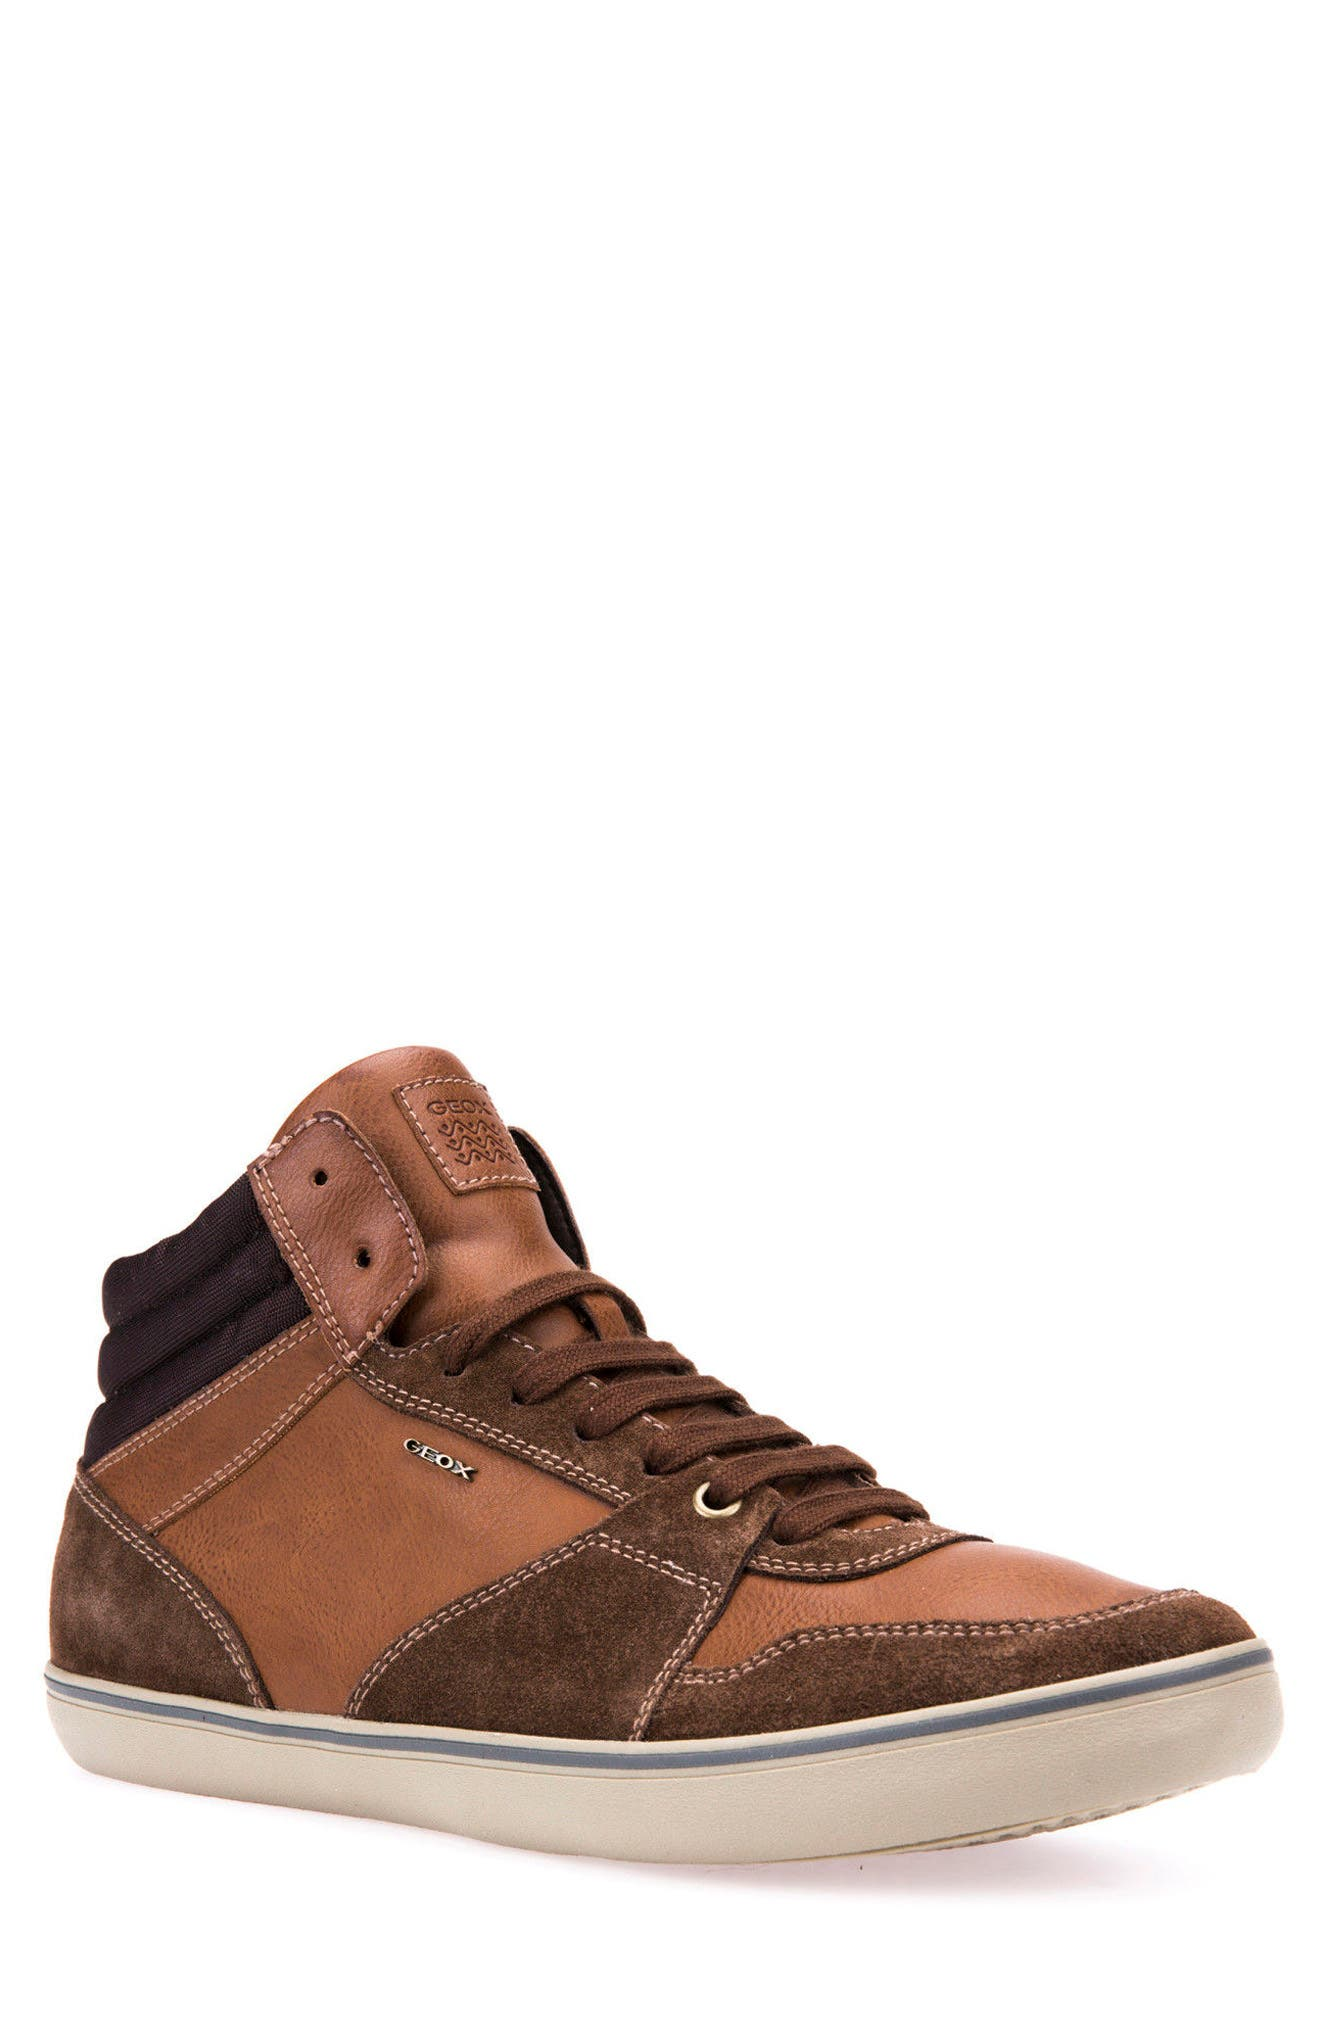 Box 30 High Top Sneaker,                             Main thumbnail 1, color,